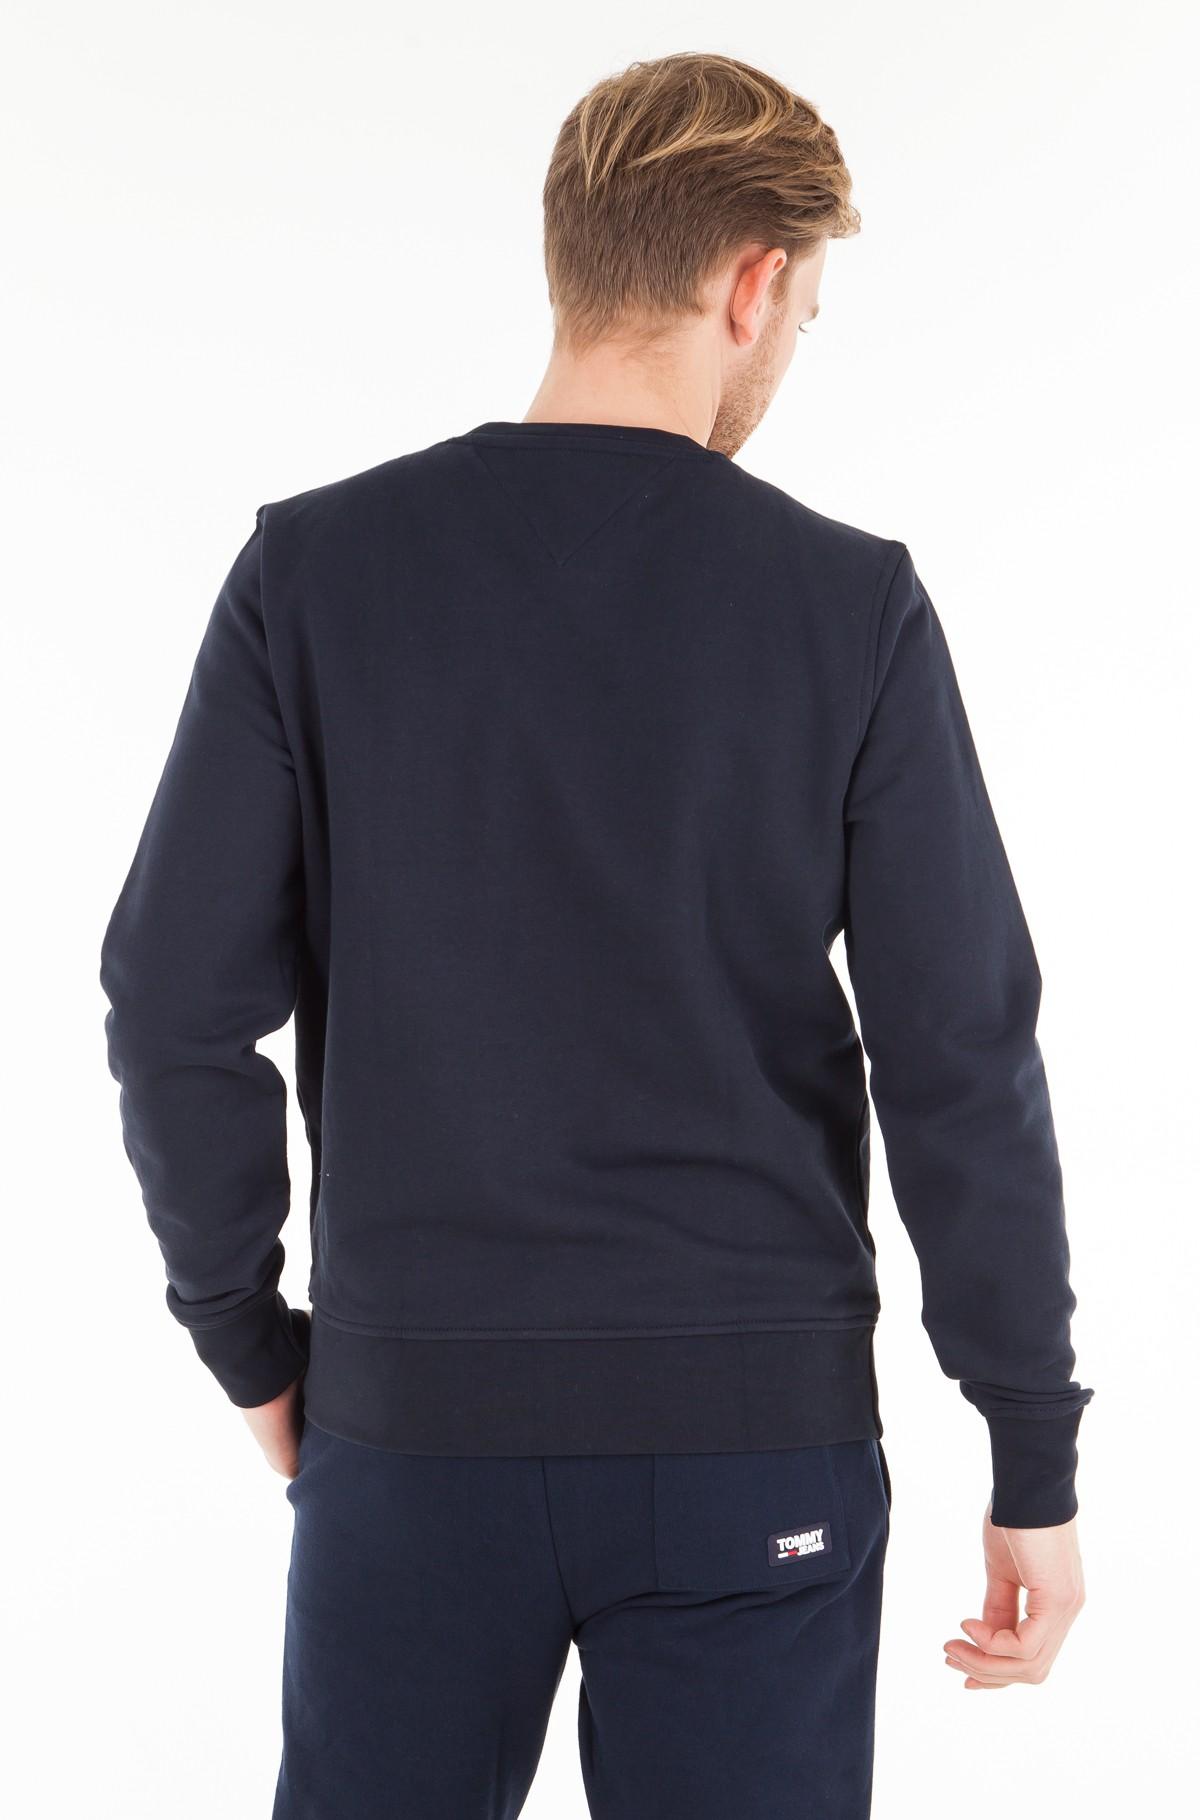 Sporta džemperis CORE COTTON SWEATSHIRT-full-2